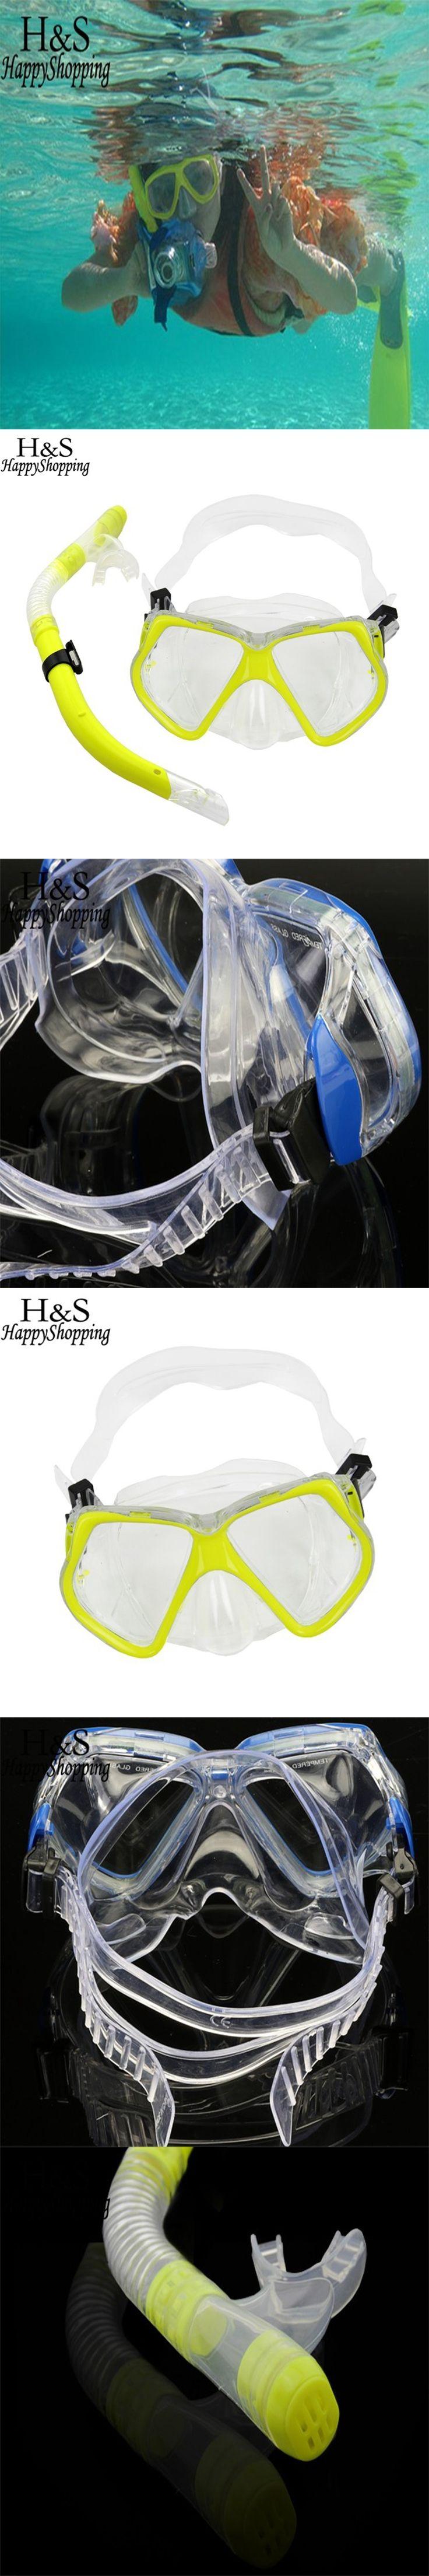 2017 New Underwater Sea Scuba Diving Snorkeling Mask Swimming Glasses + Dry Snorkel Set Scuba Snorkeling Gear Kit Pool Equipment